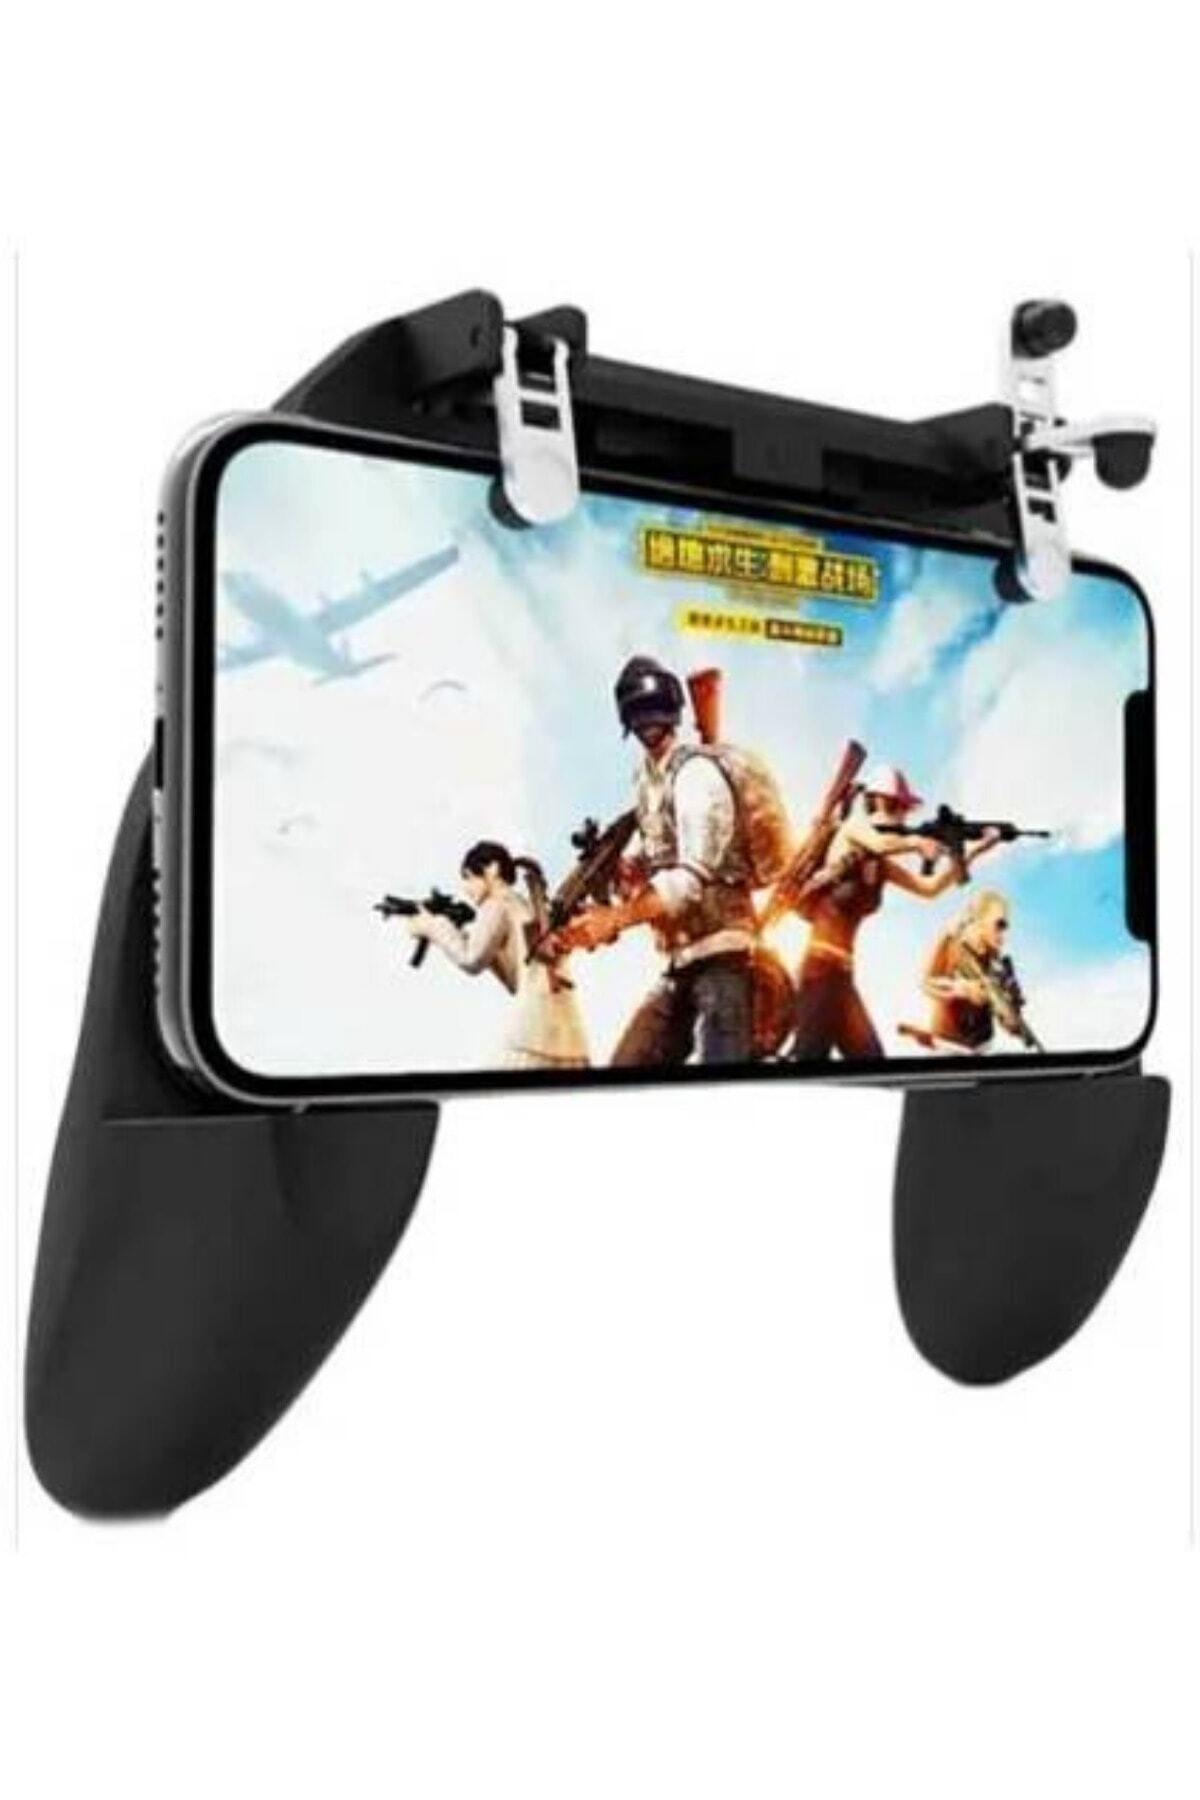 BaykalElektronik Pubg Gamepad Metal Tetik W10 Joystick Oyun Konsol Ateş Düğme L1 R1 Aparatı 2